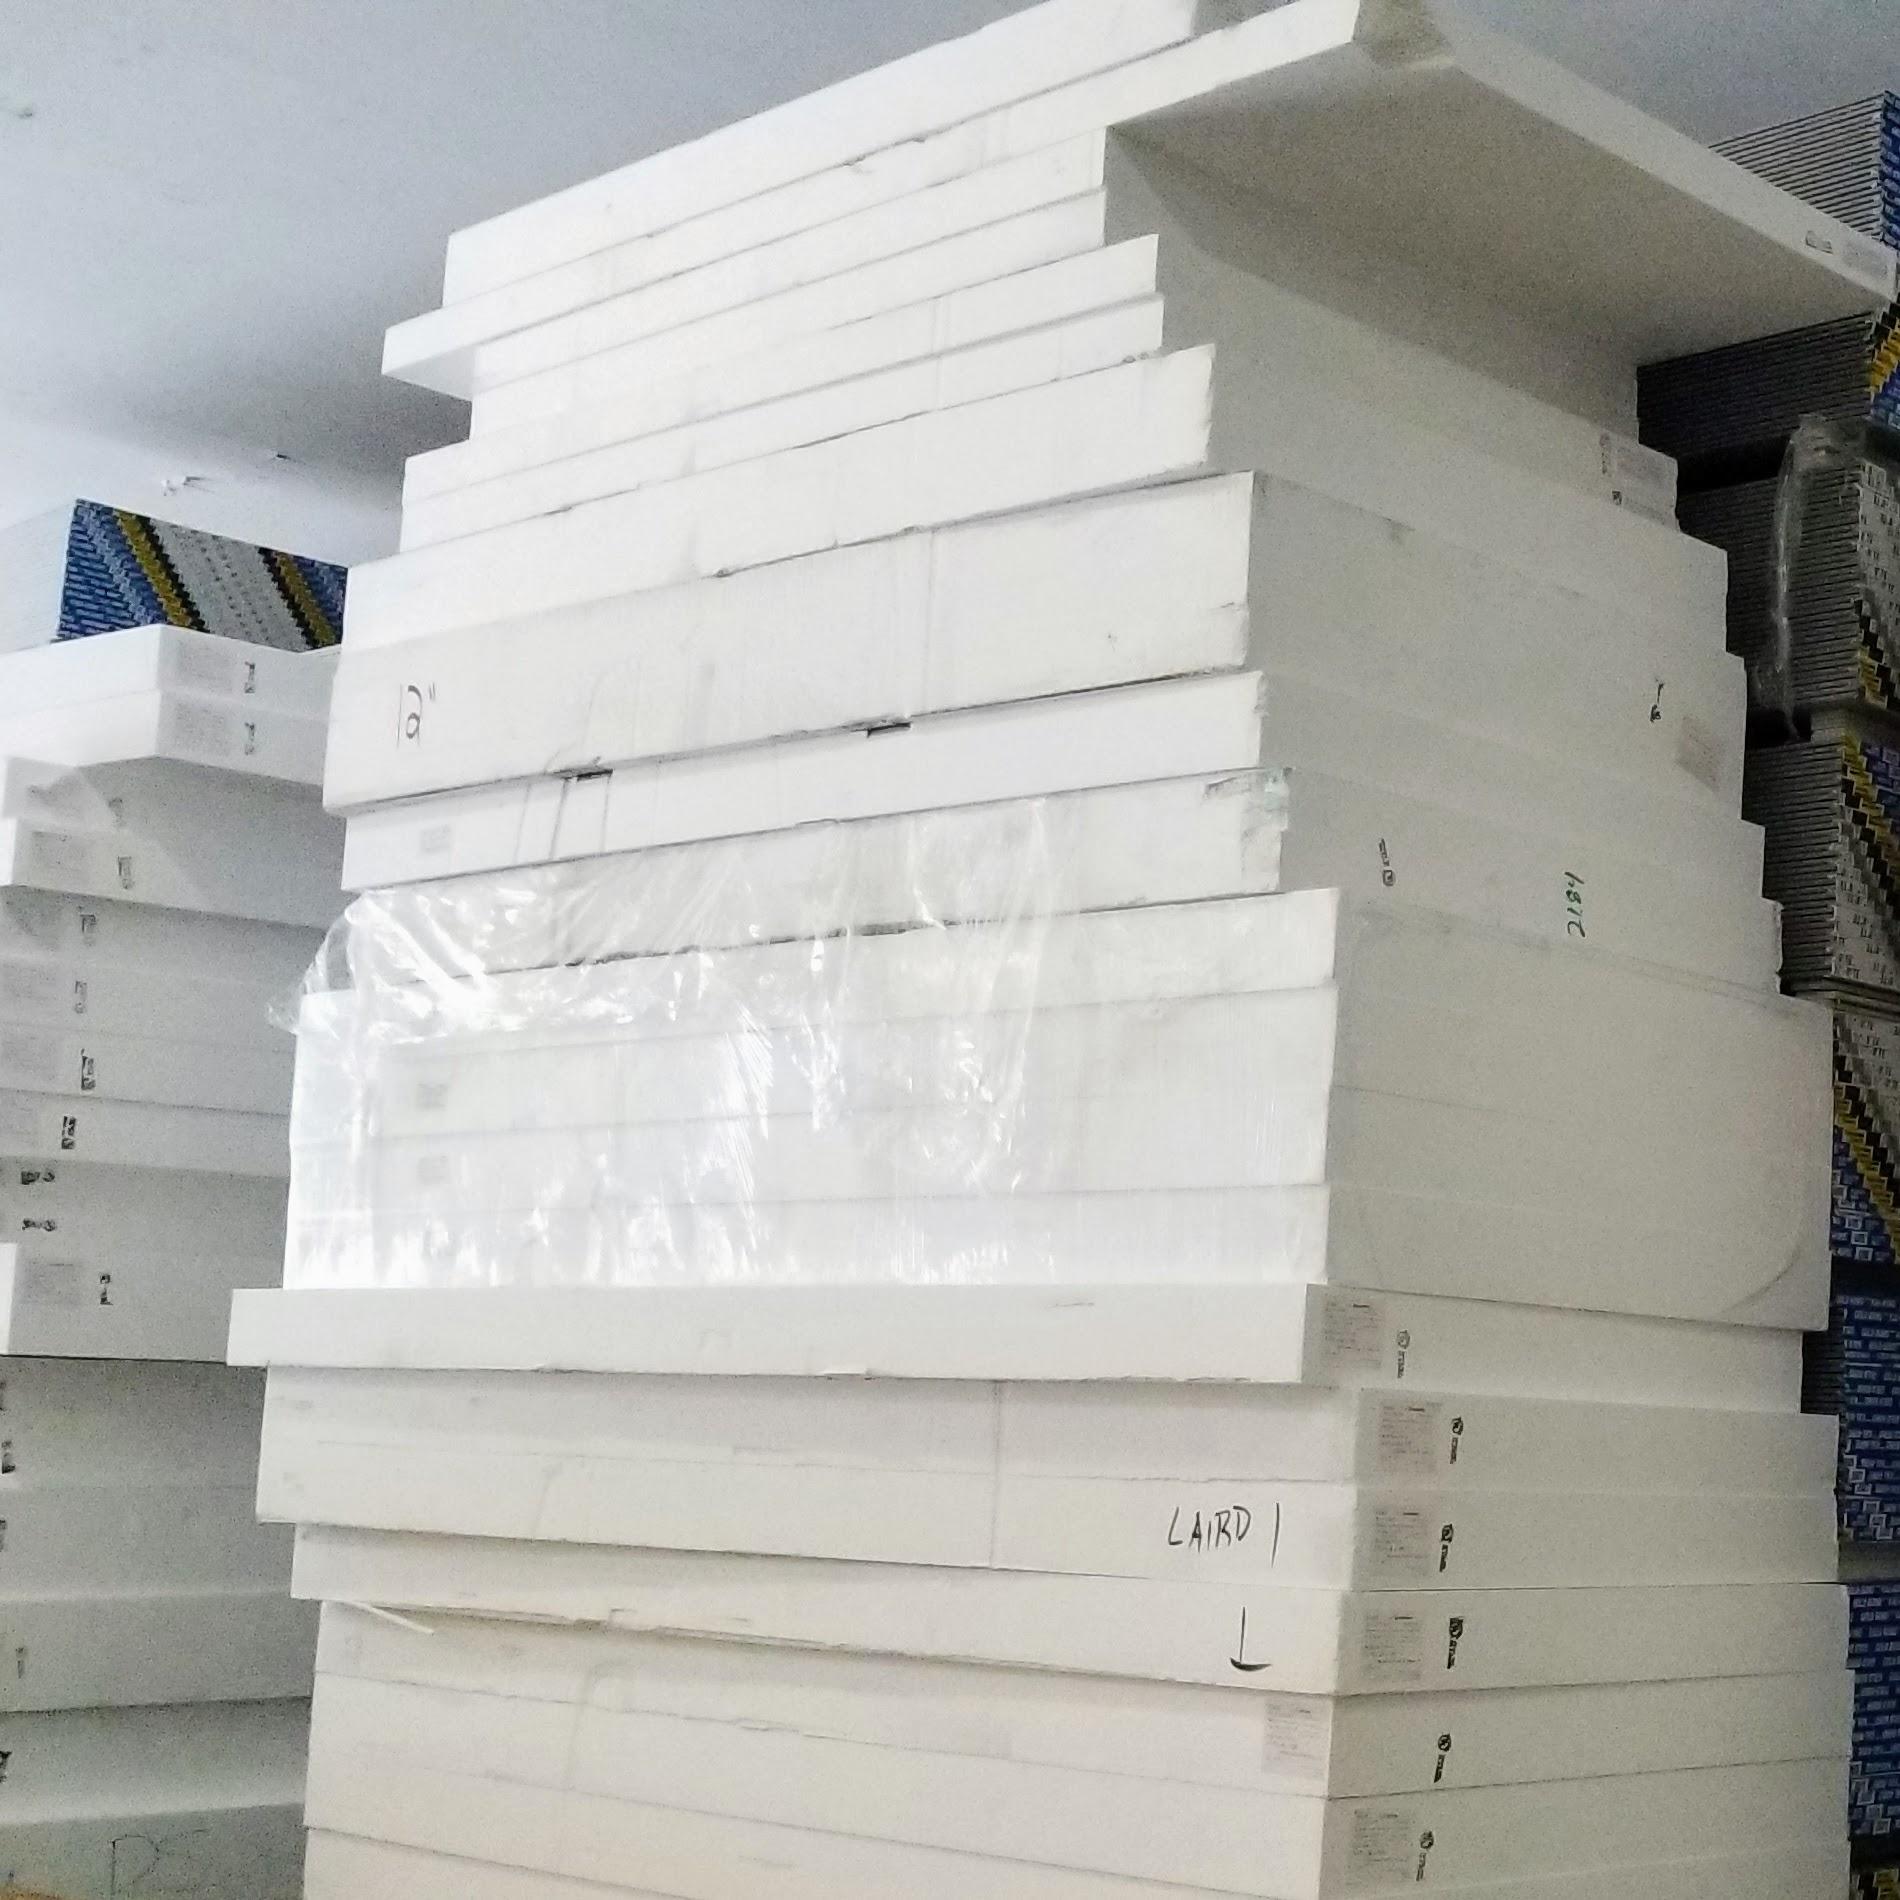 Foam Core three kinds: EPS, PIR, or NEO -